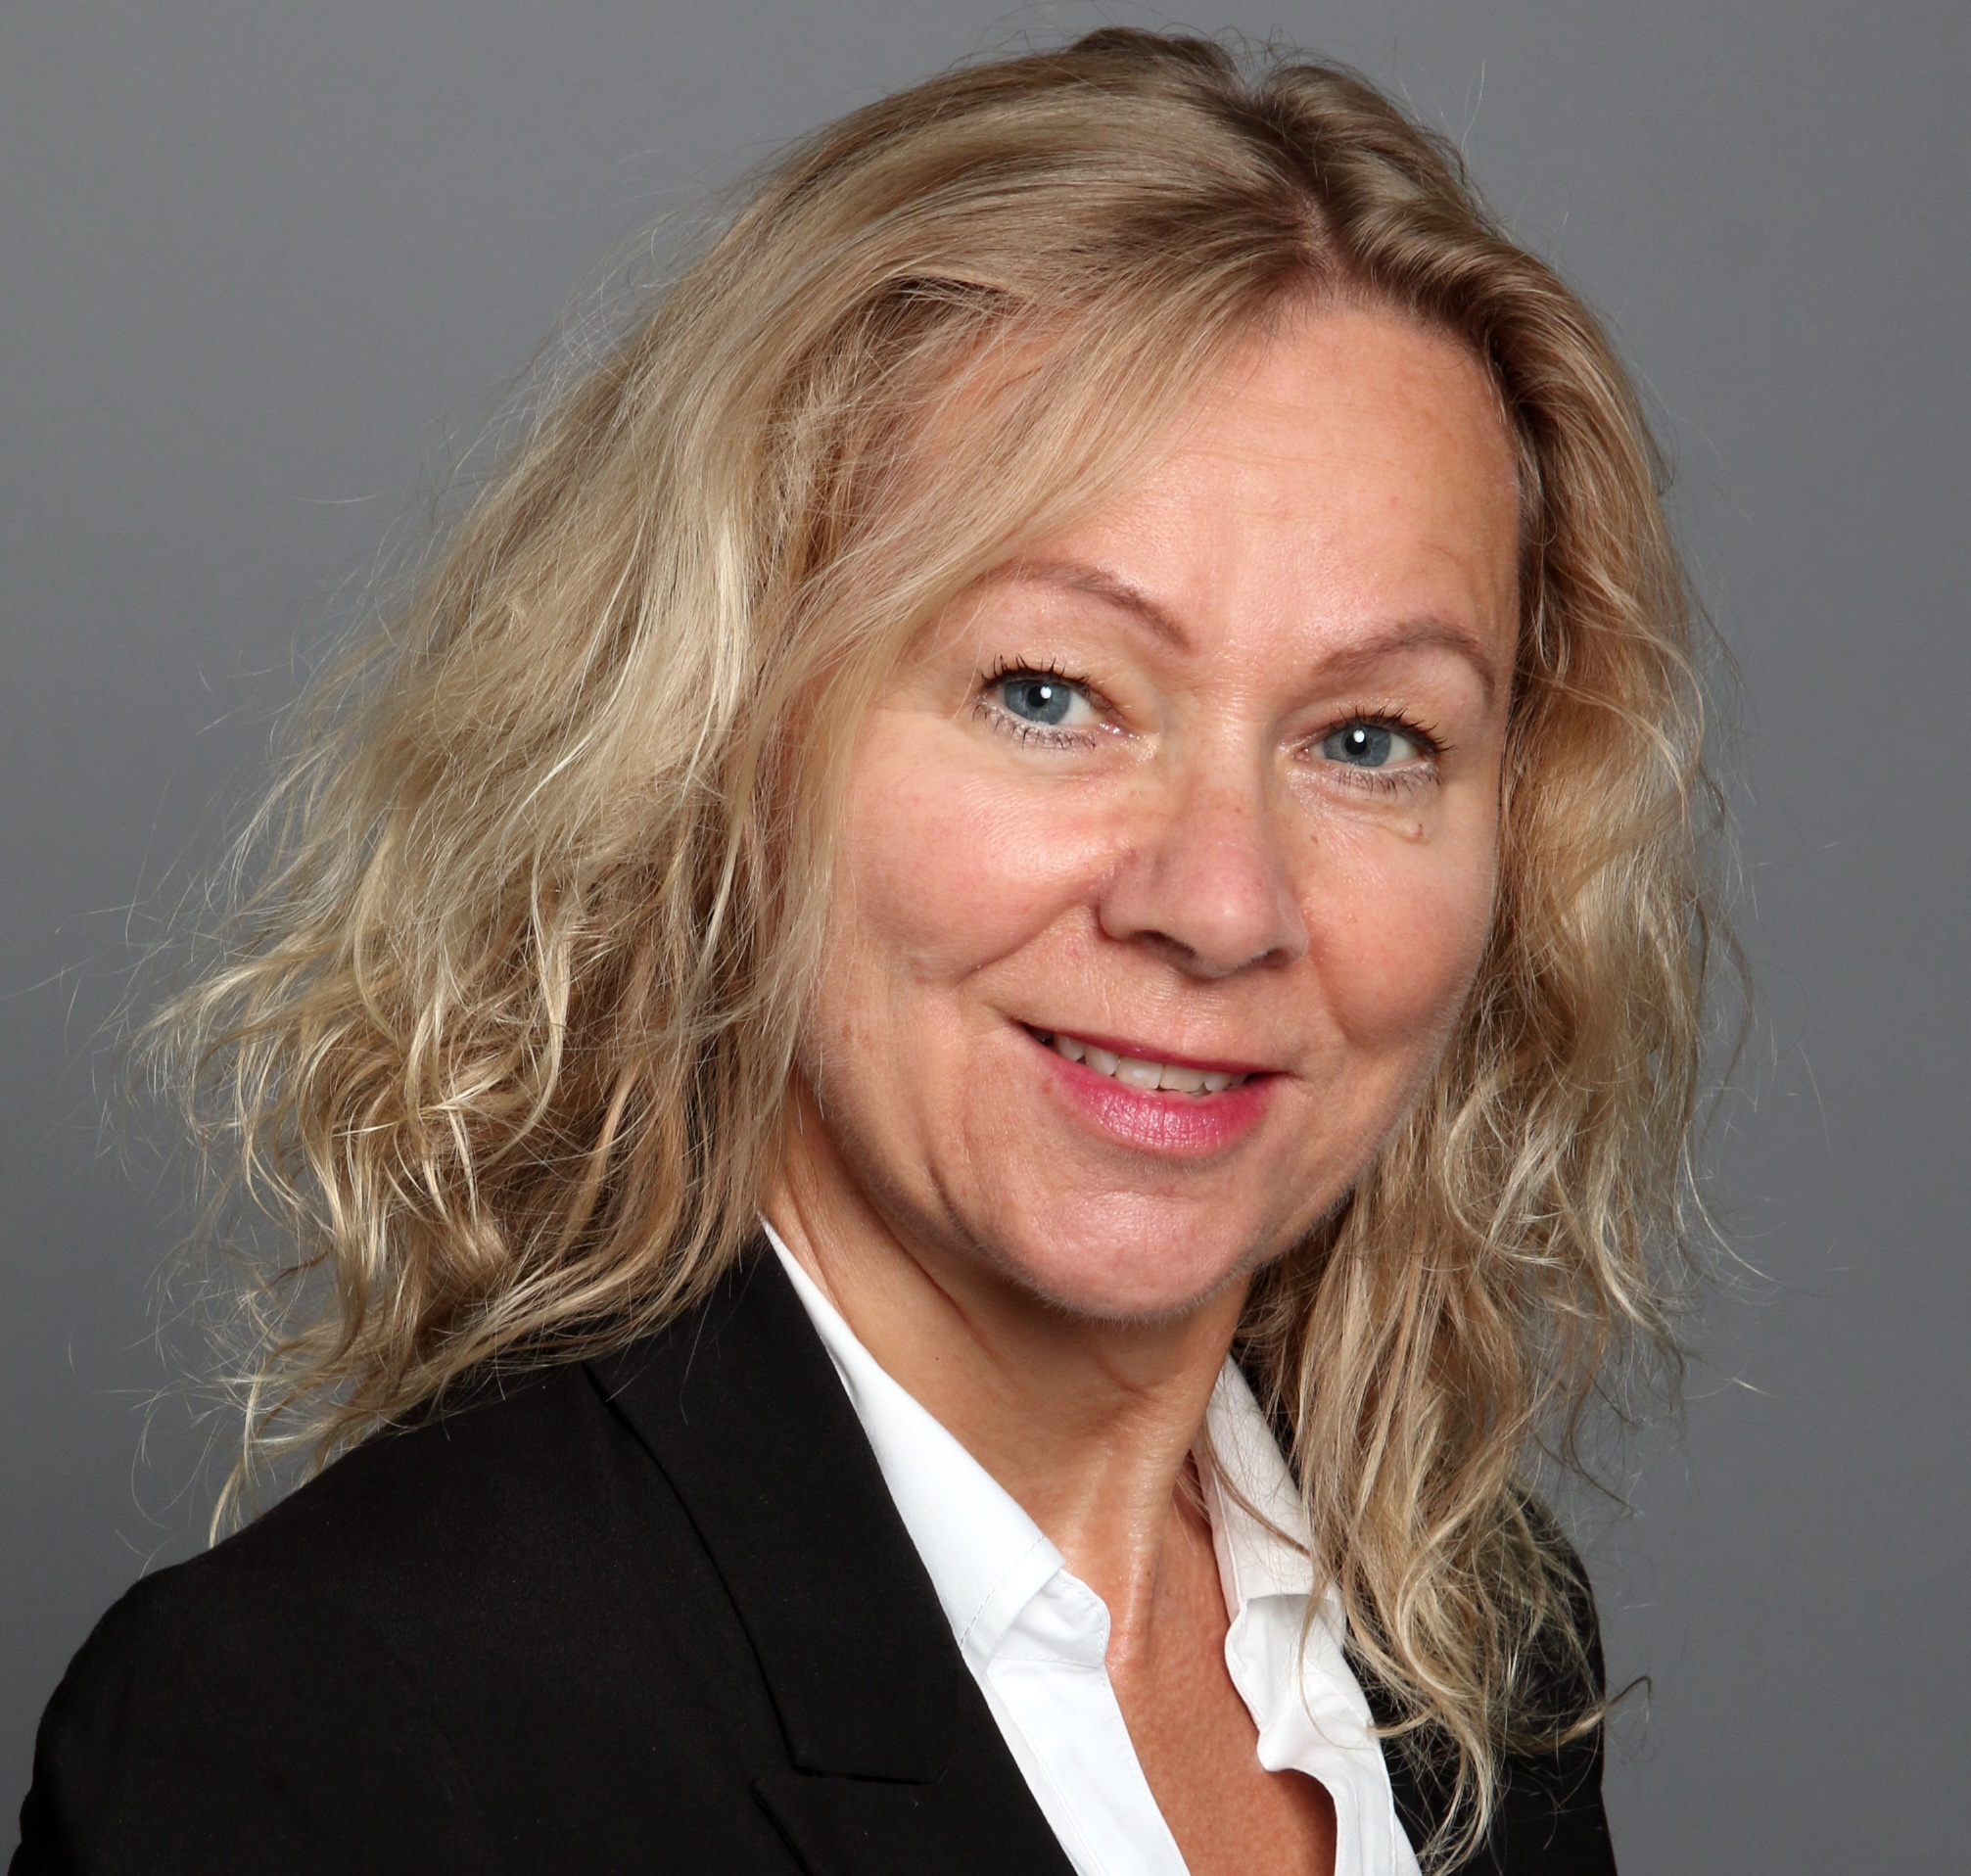 Unsere Neuzugänge – Frau Danja Zyber